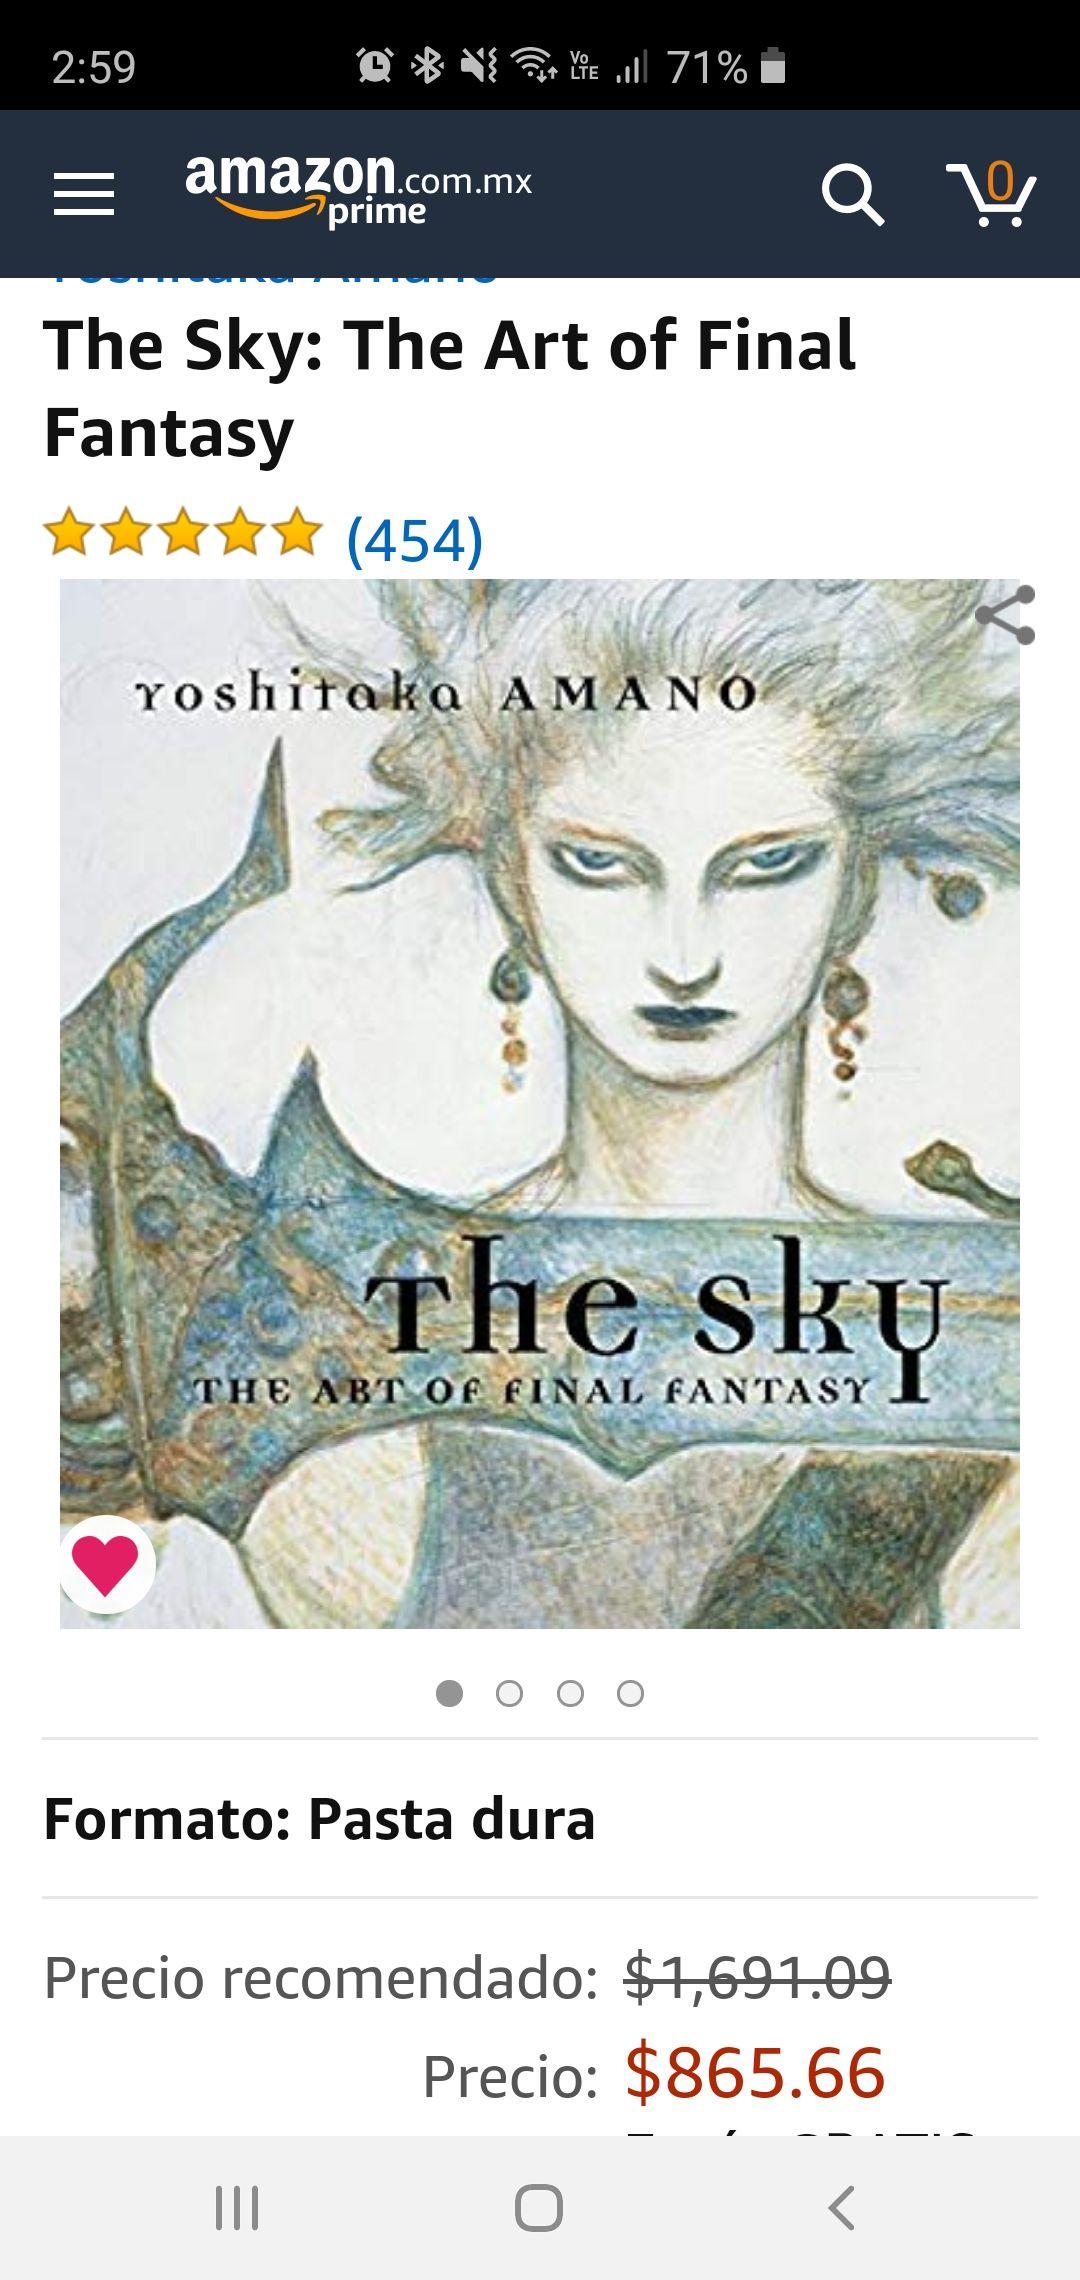 Amazon: The Sky: The Art of Final Fantasy